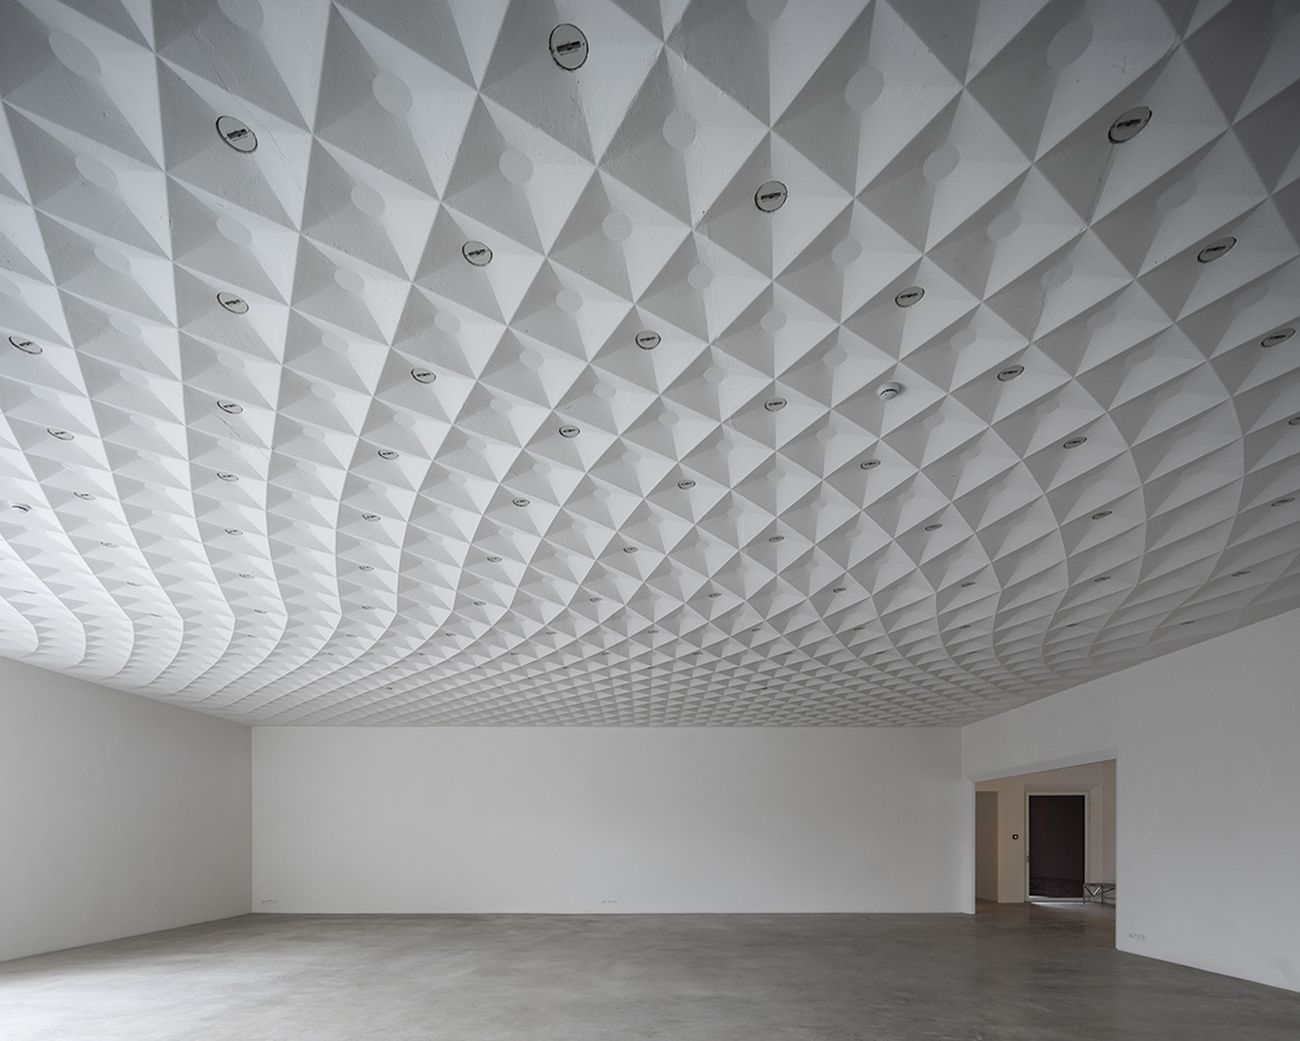 Francesca Torzo, Z33 House for Contemporary Art, Design & Architecture, Hasselt 2020. Photo © Kristof Vrancken